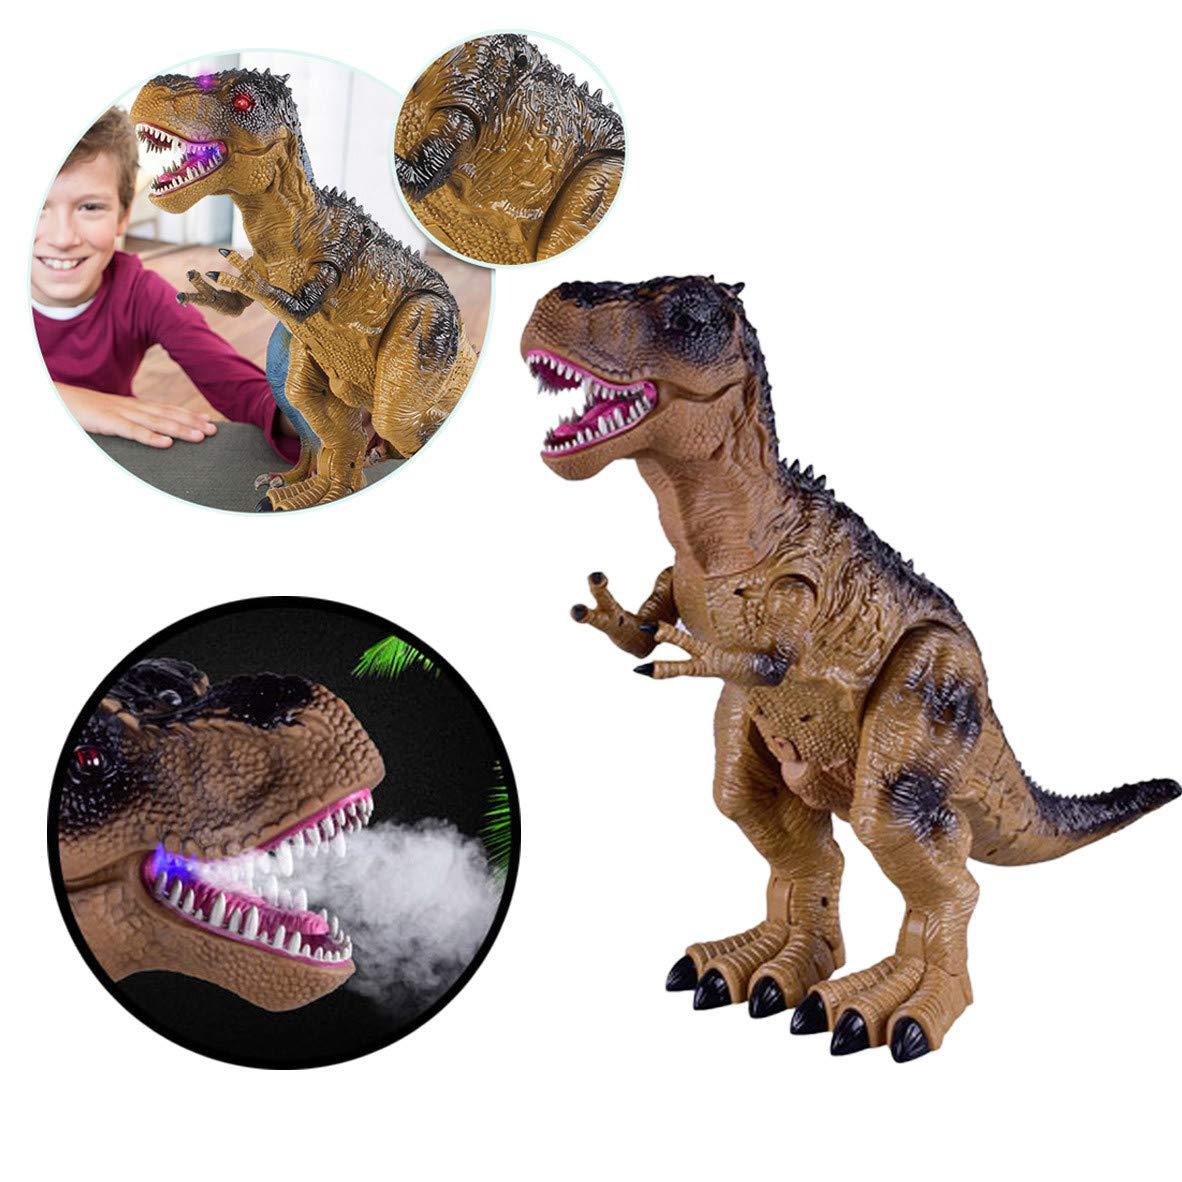 Sannysis Christmas Decor, Remote Control Walking Dinosaur Toy Fire Breathing Water Spray by Sannysis (Image #3)